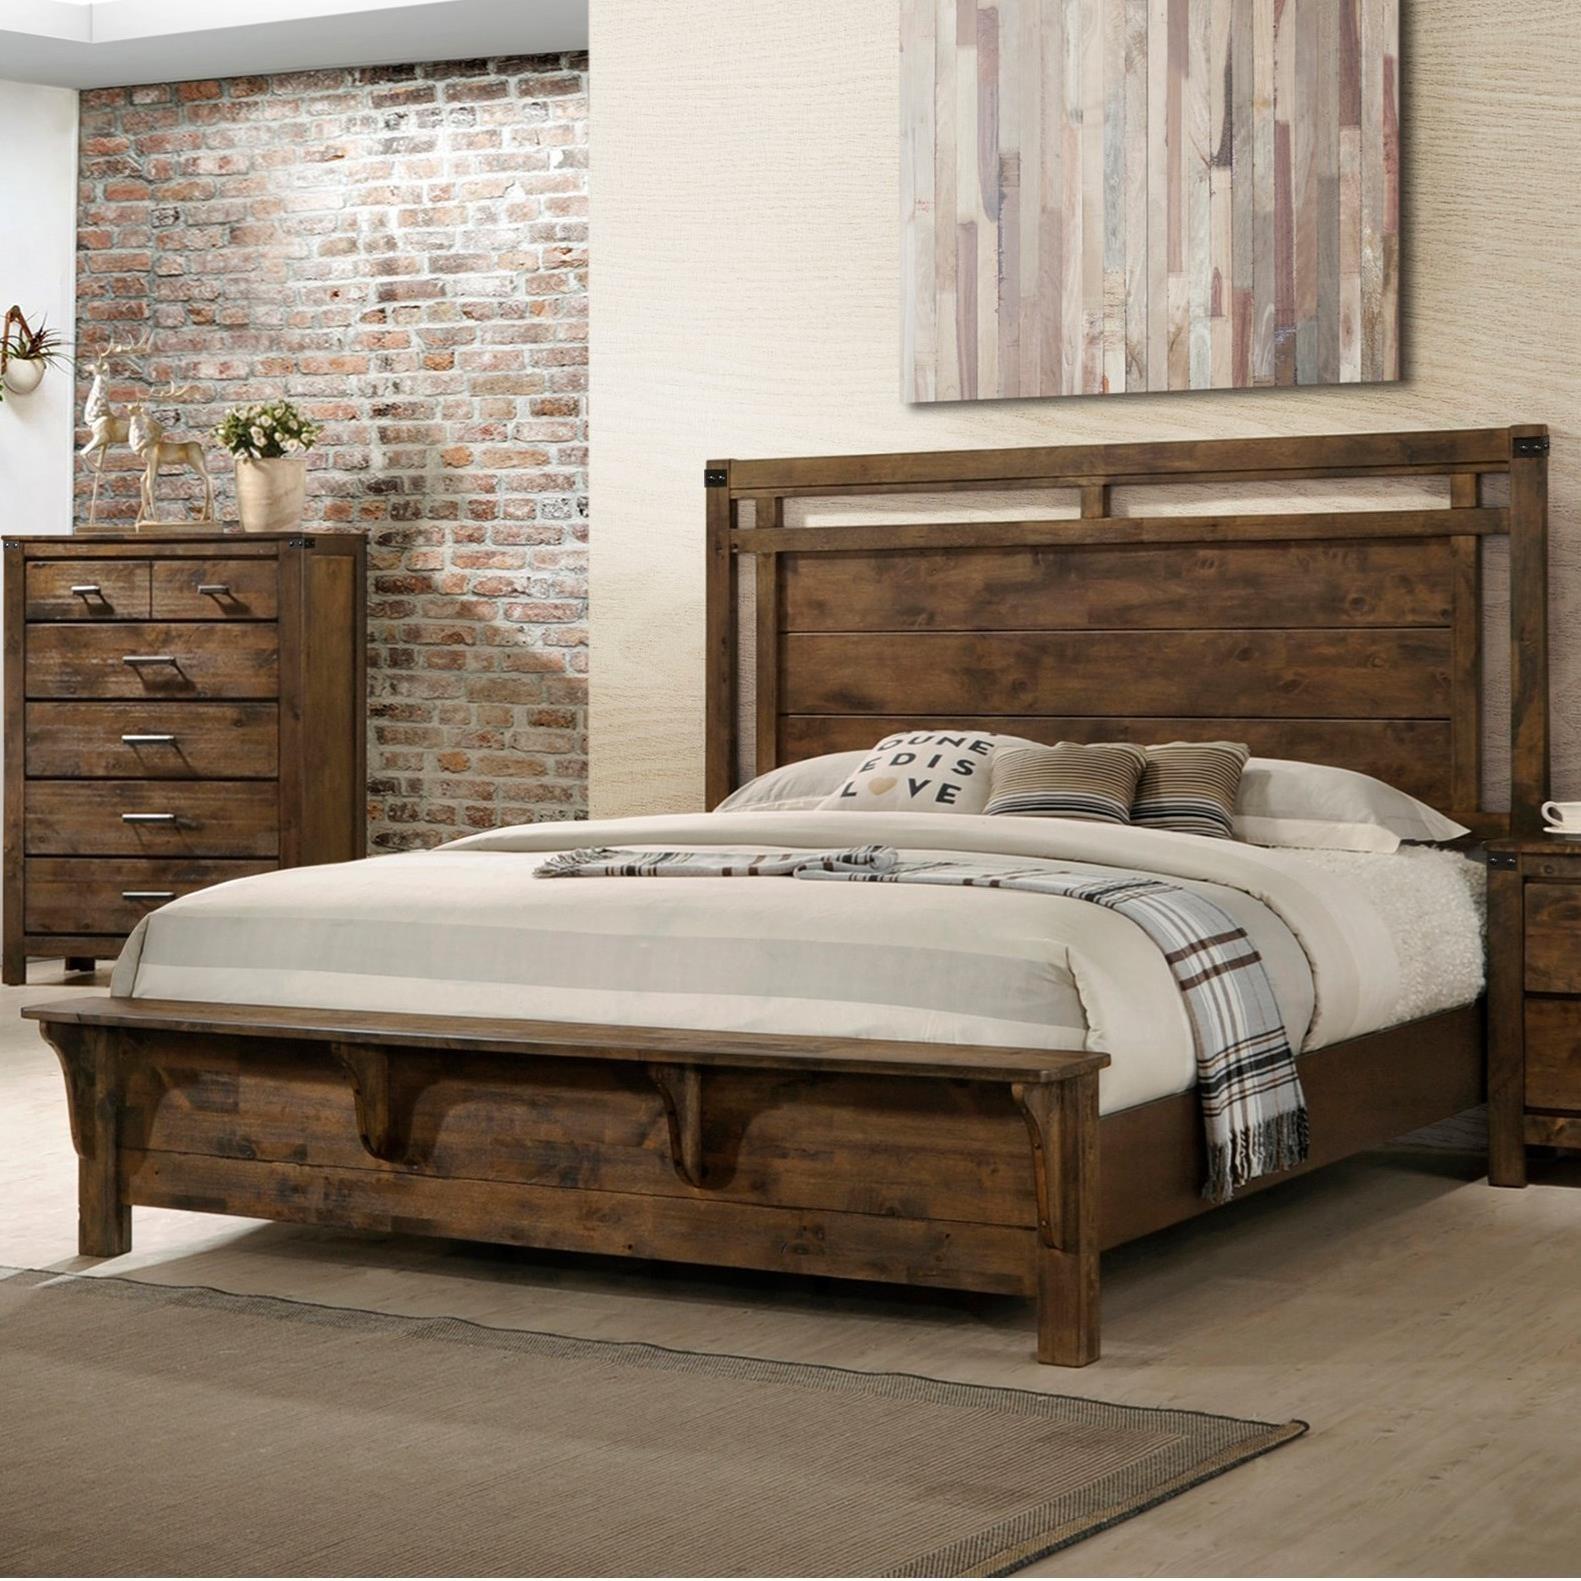 Queen Panel Bed in Rustic Finish